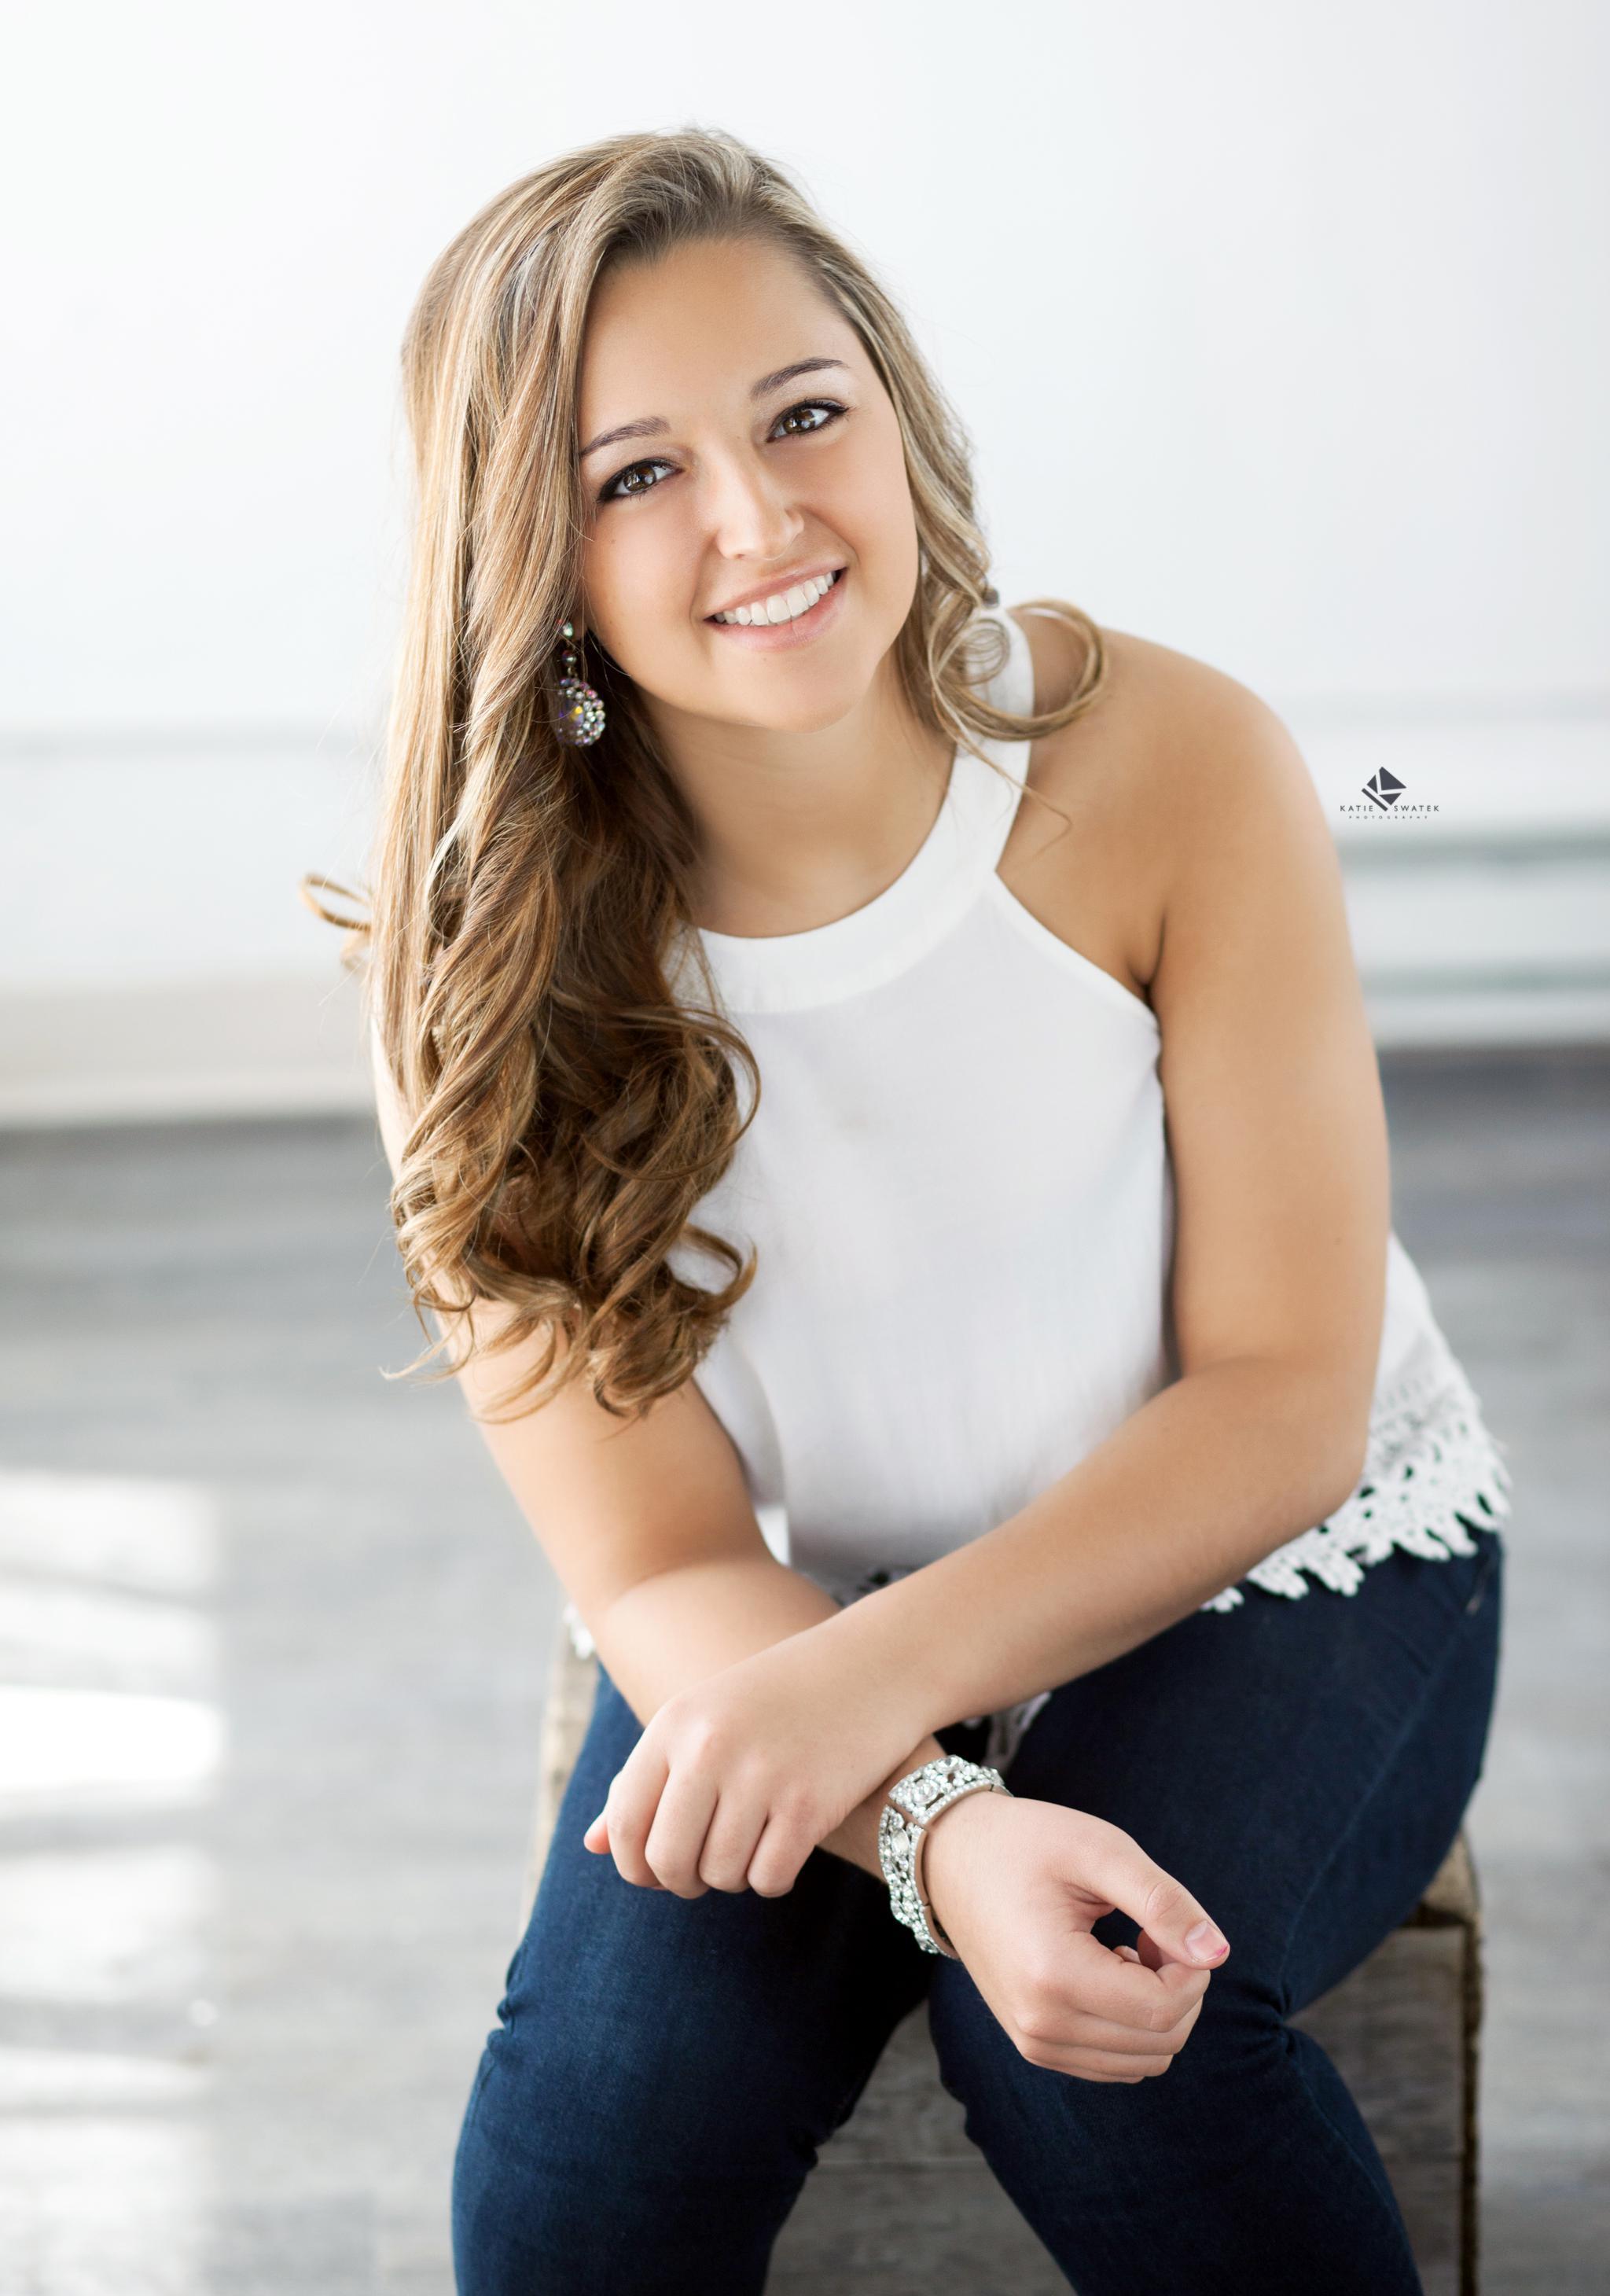 brunette senior girl in a white top and dark denim jeans in a white studio setting